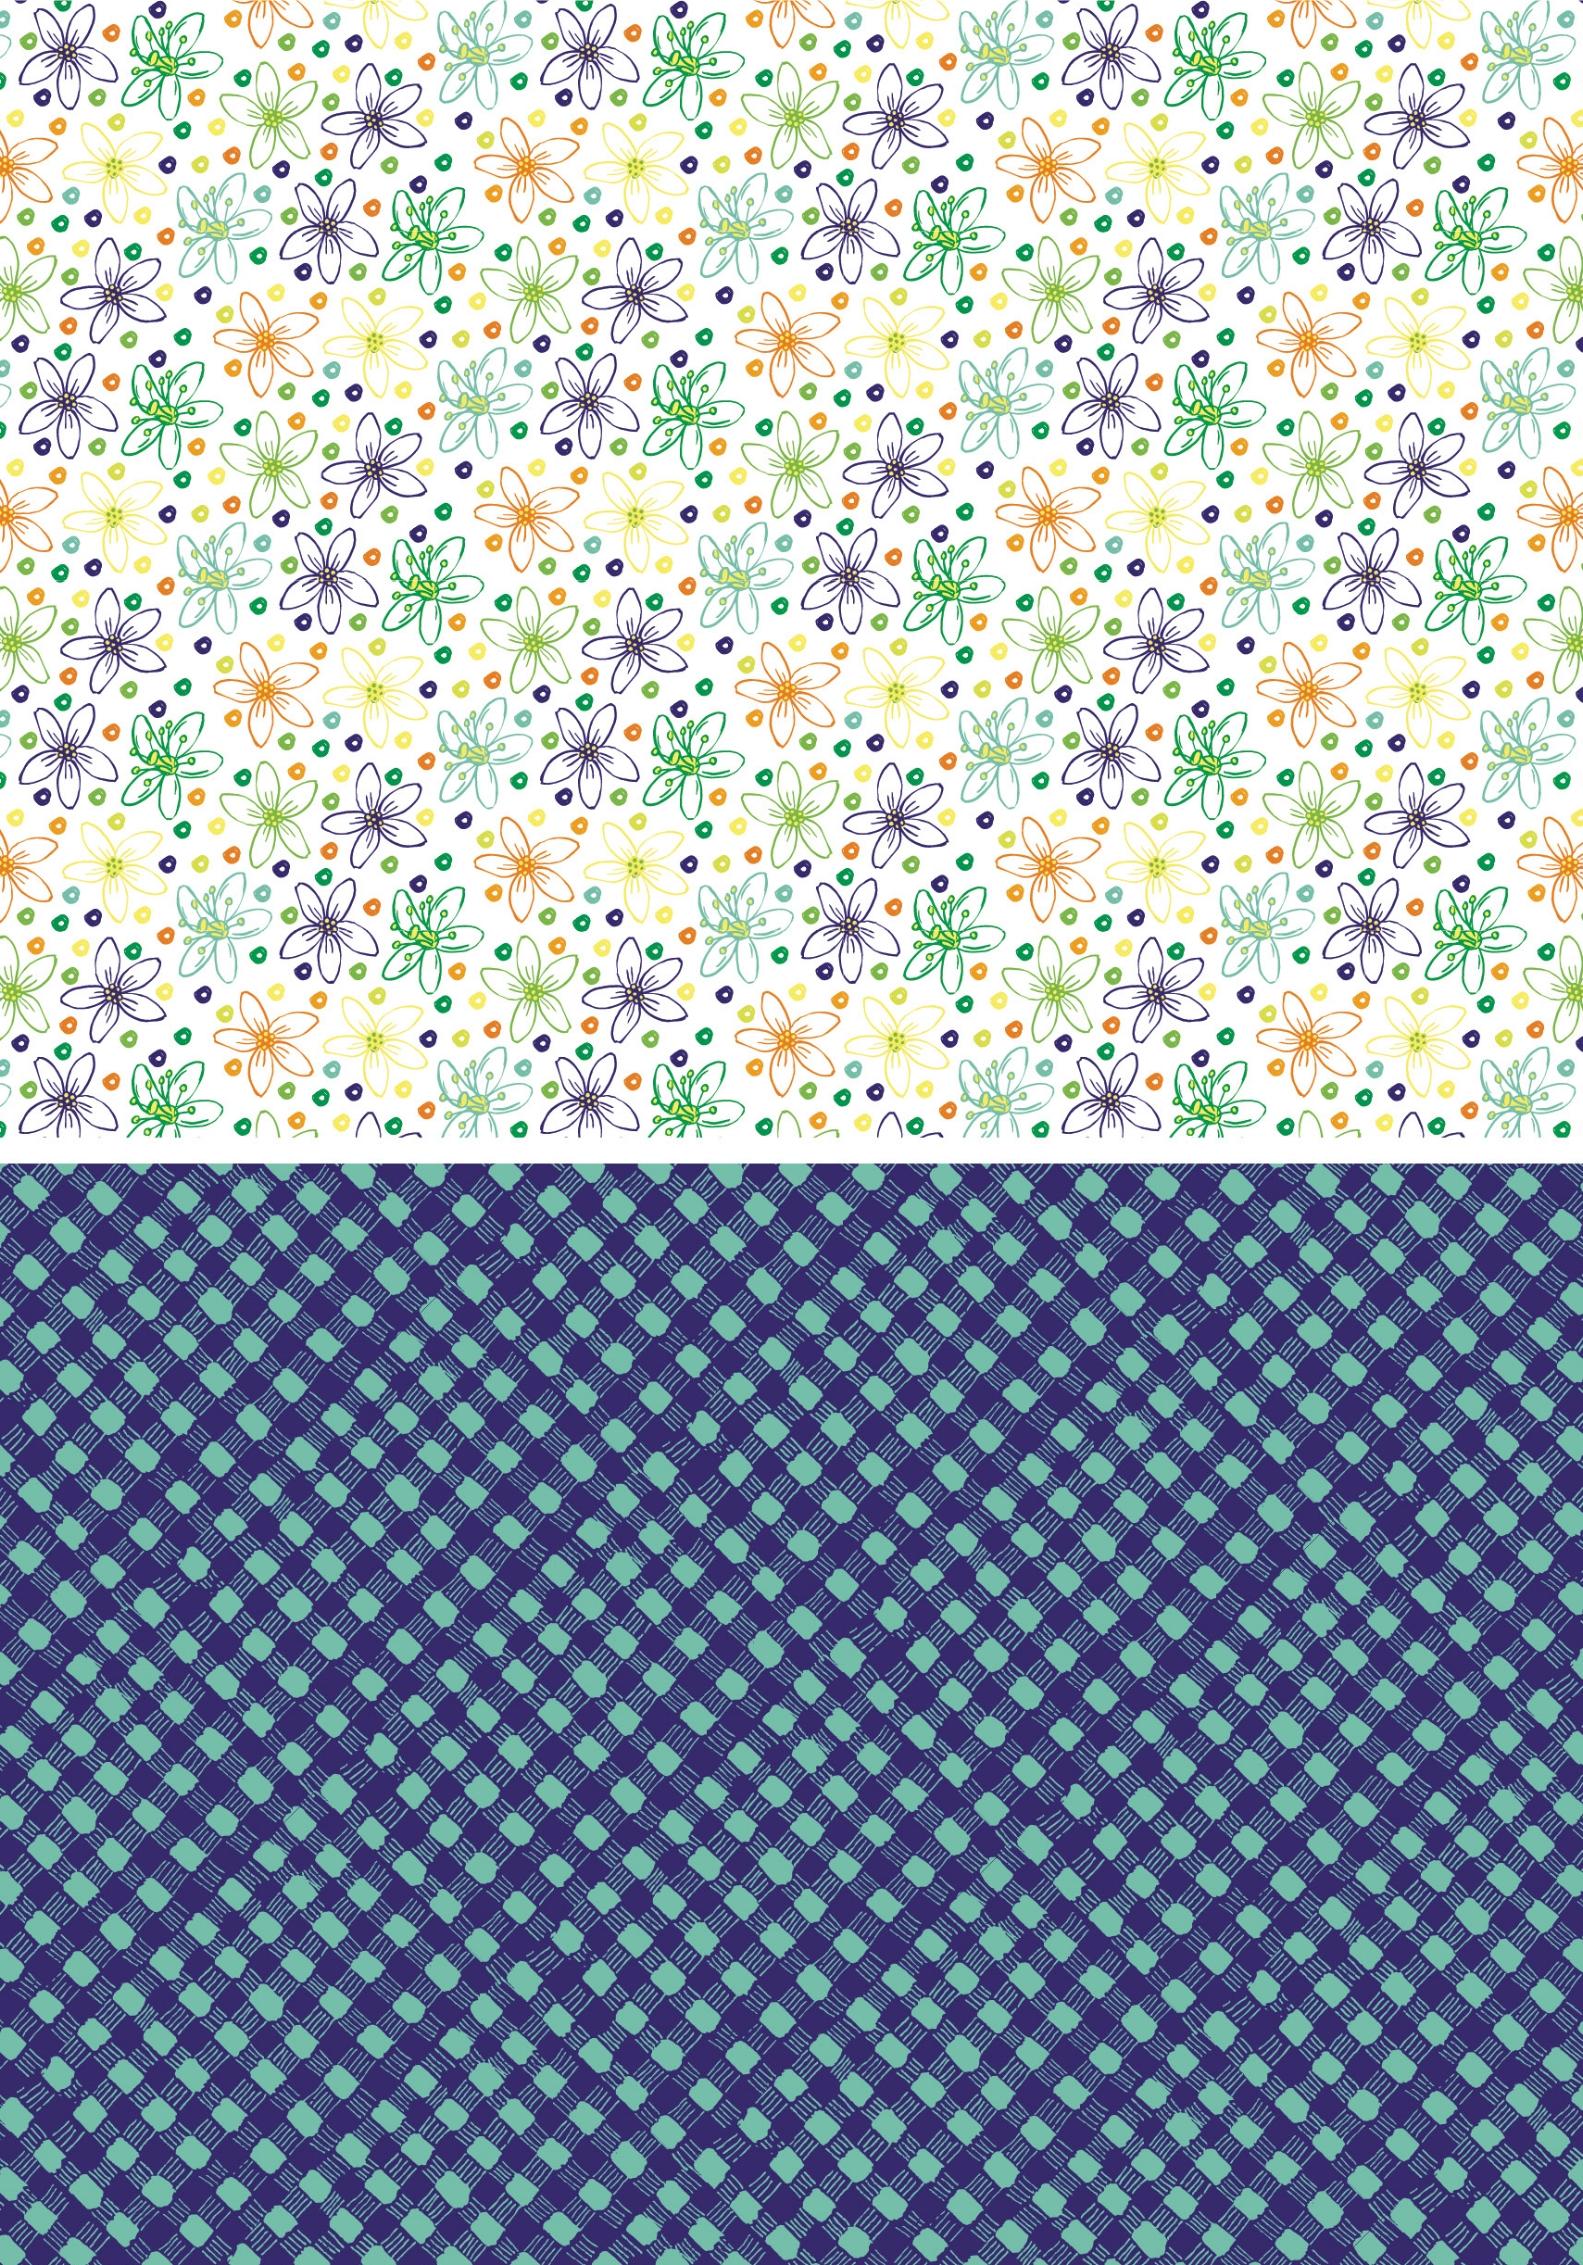 BlueprintPrints-AmyFrazer 101-12016.jpg